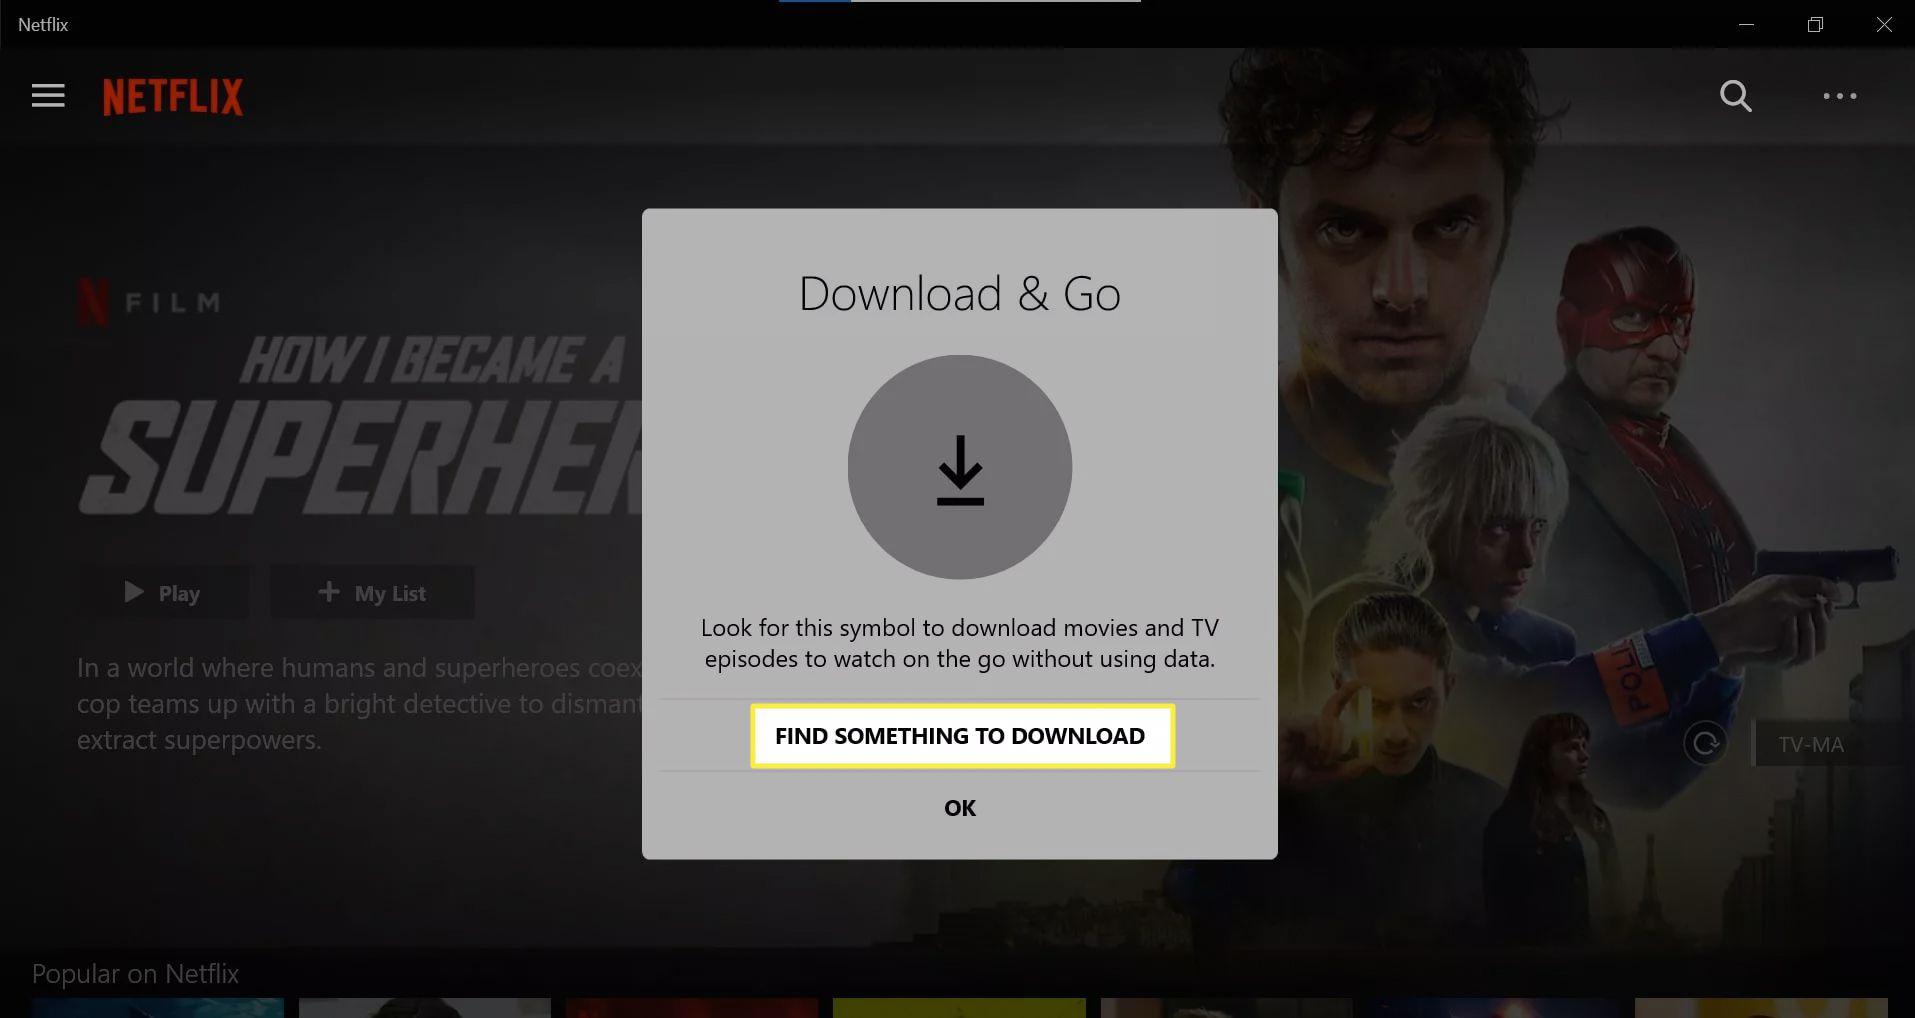 Download & Go notification on Netflix Windows app.